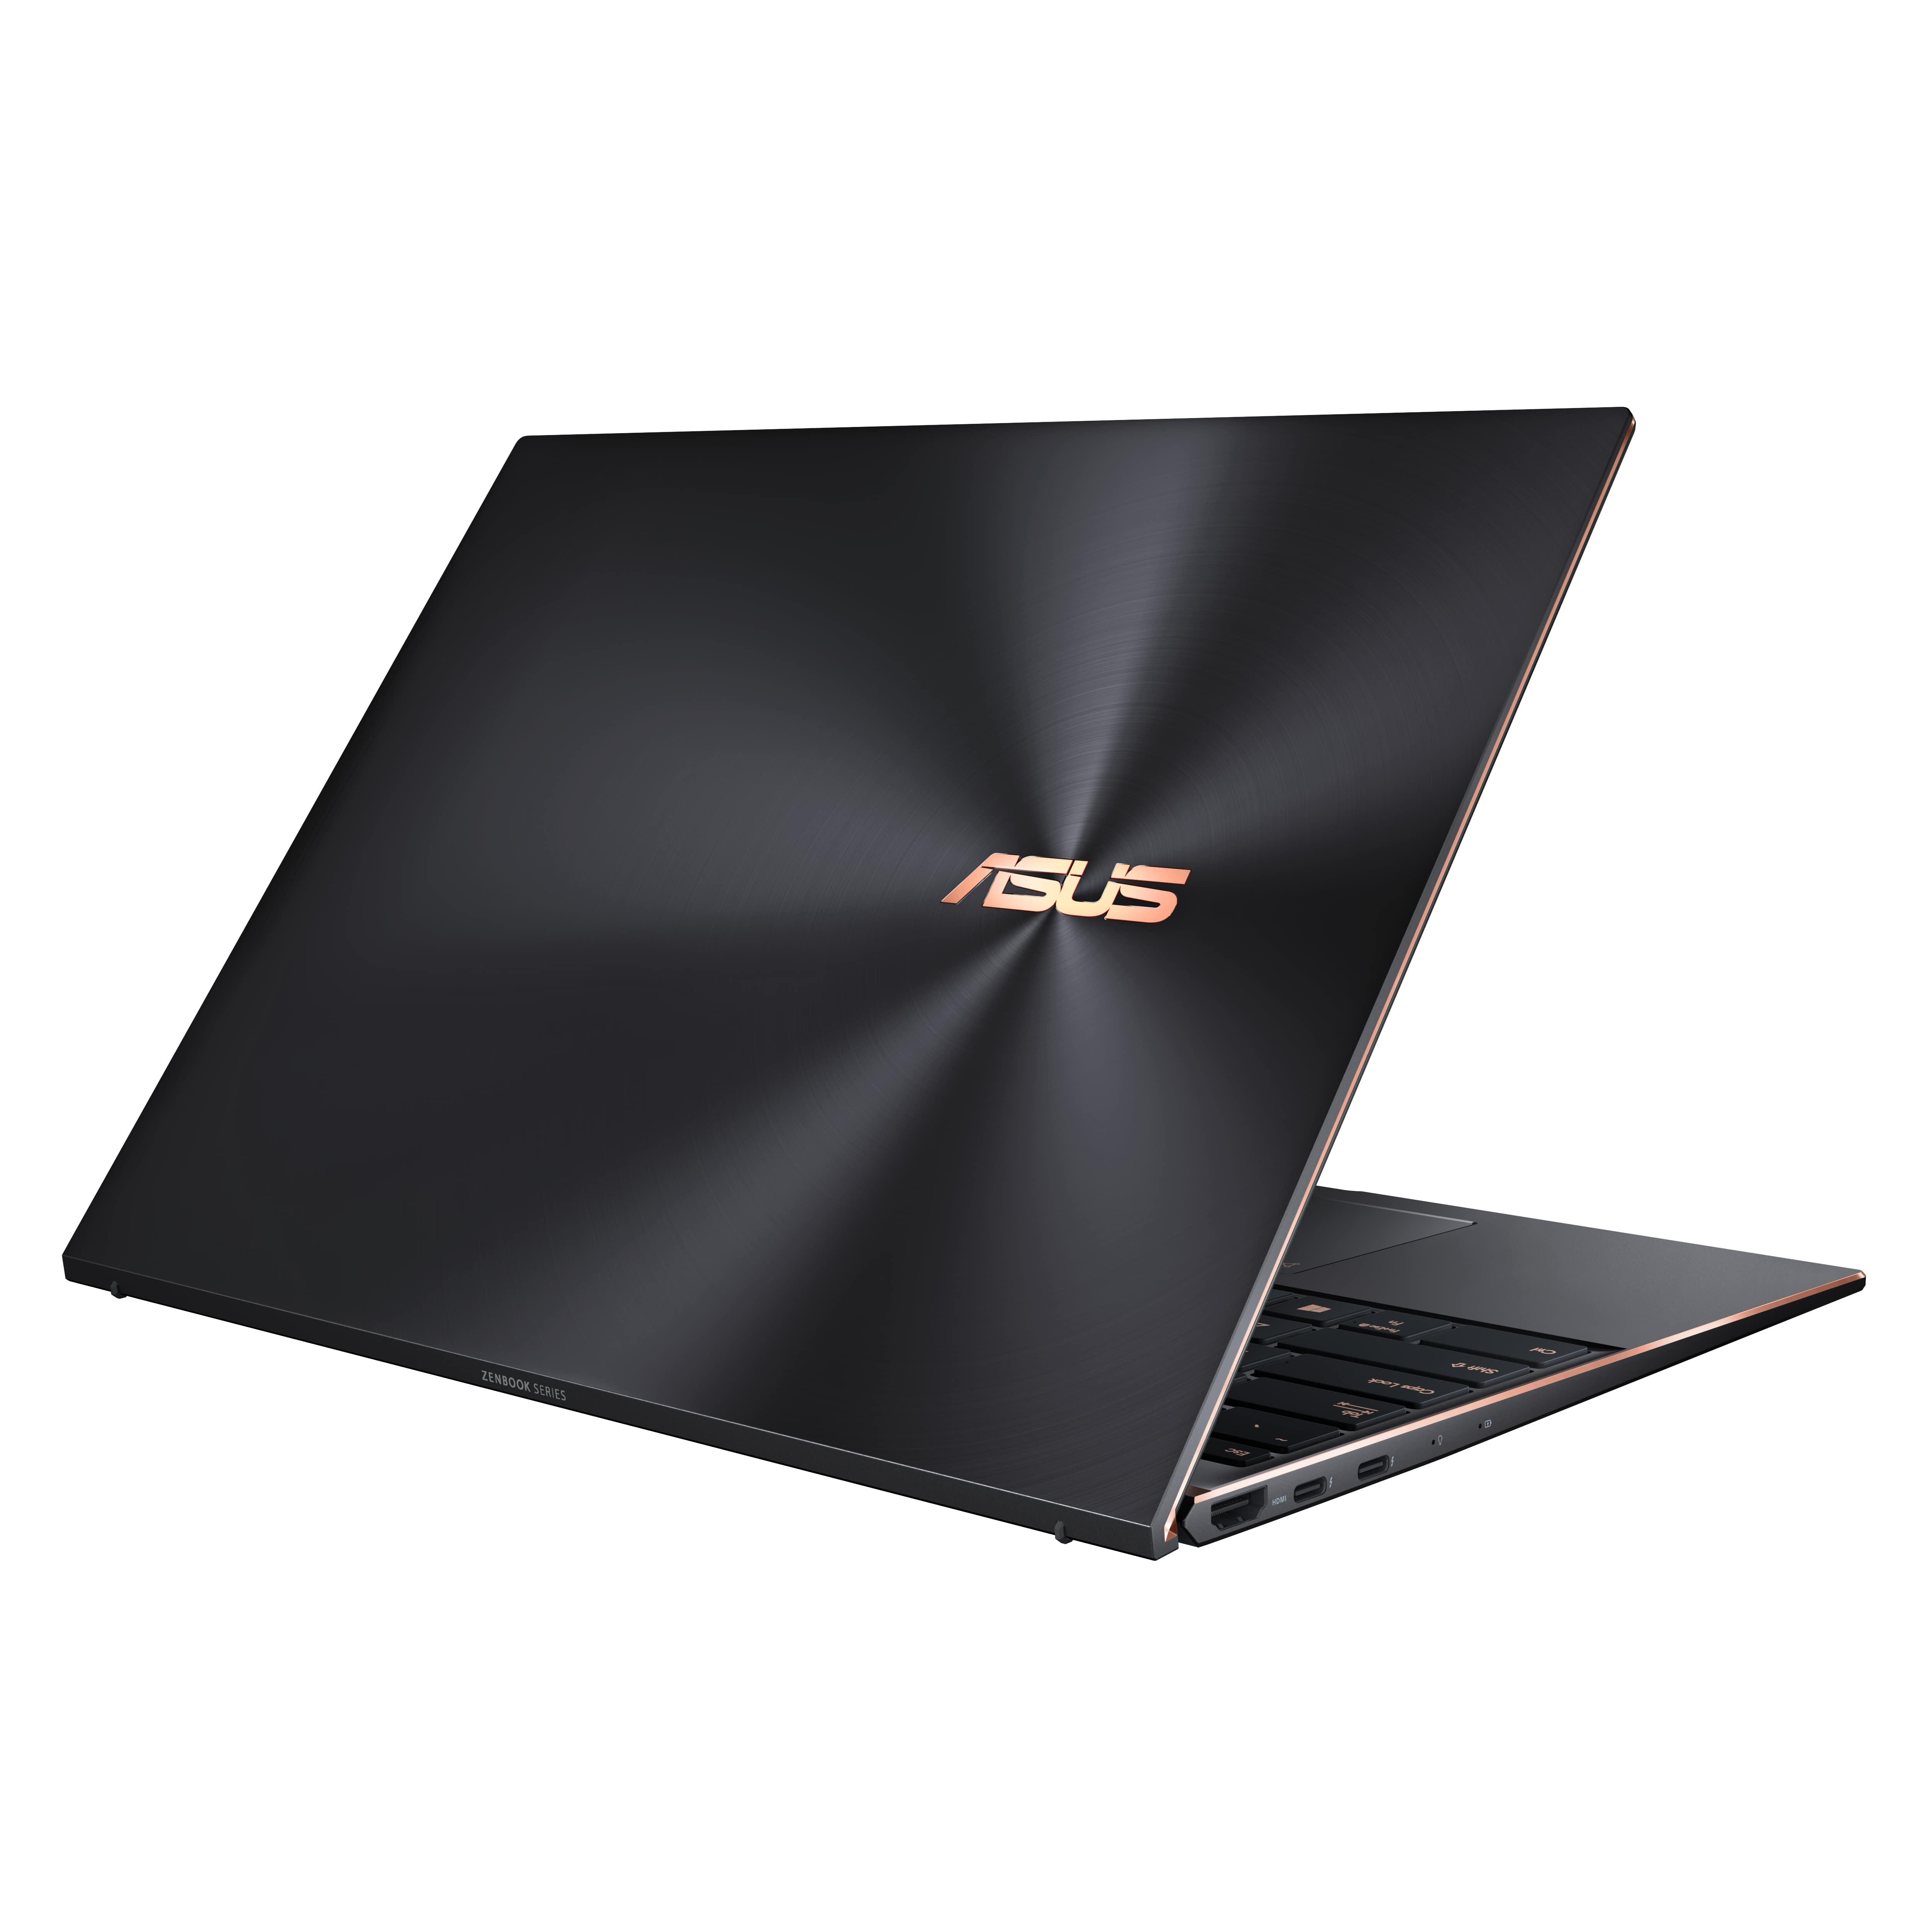 ZenBook S / 華碩電腦股份有限公司